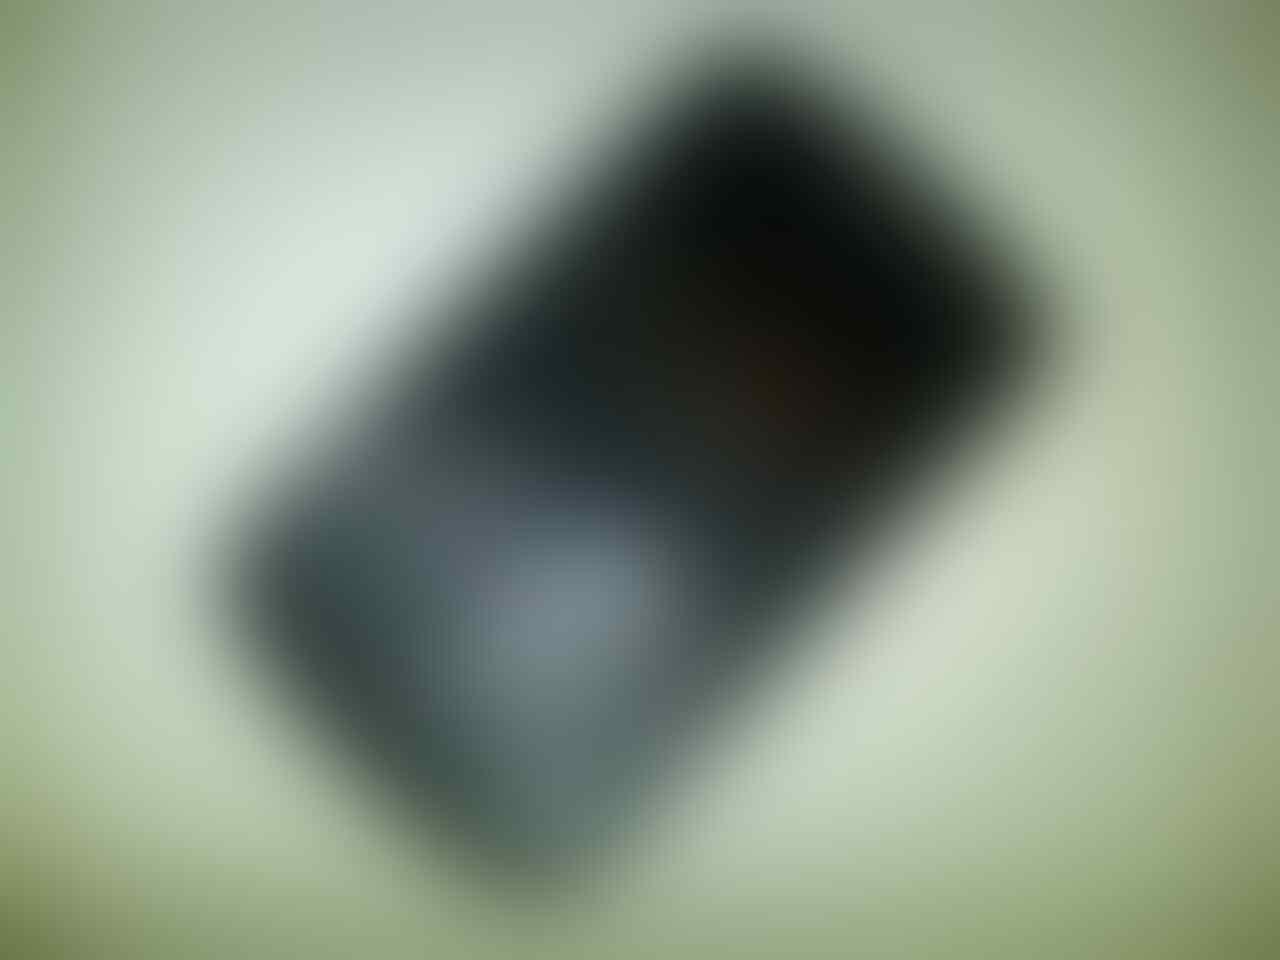 Blackberry Aries 8530 Black second Solo